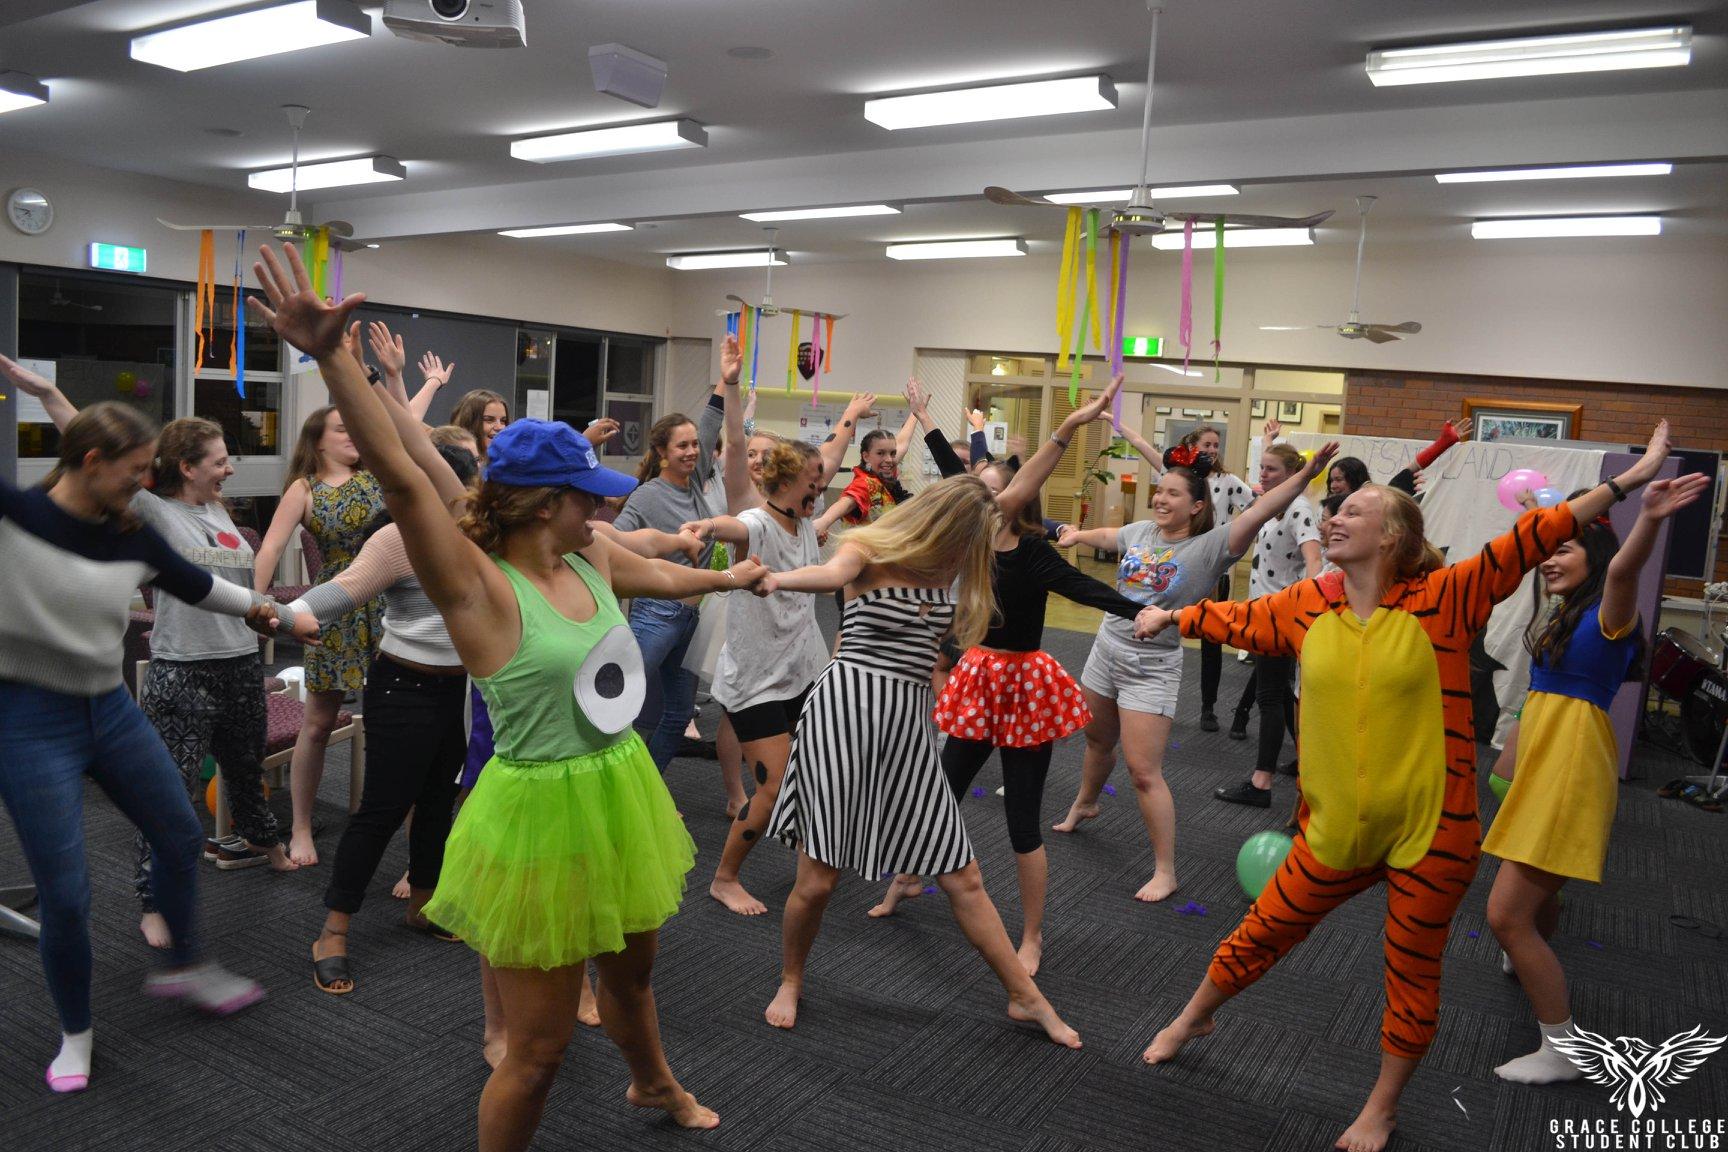 Residents practicing Disneyland themed Dancefest performance